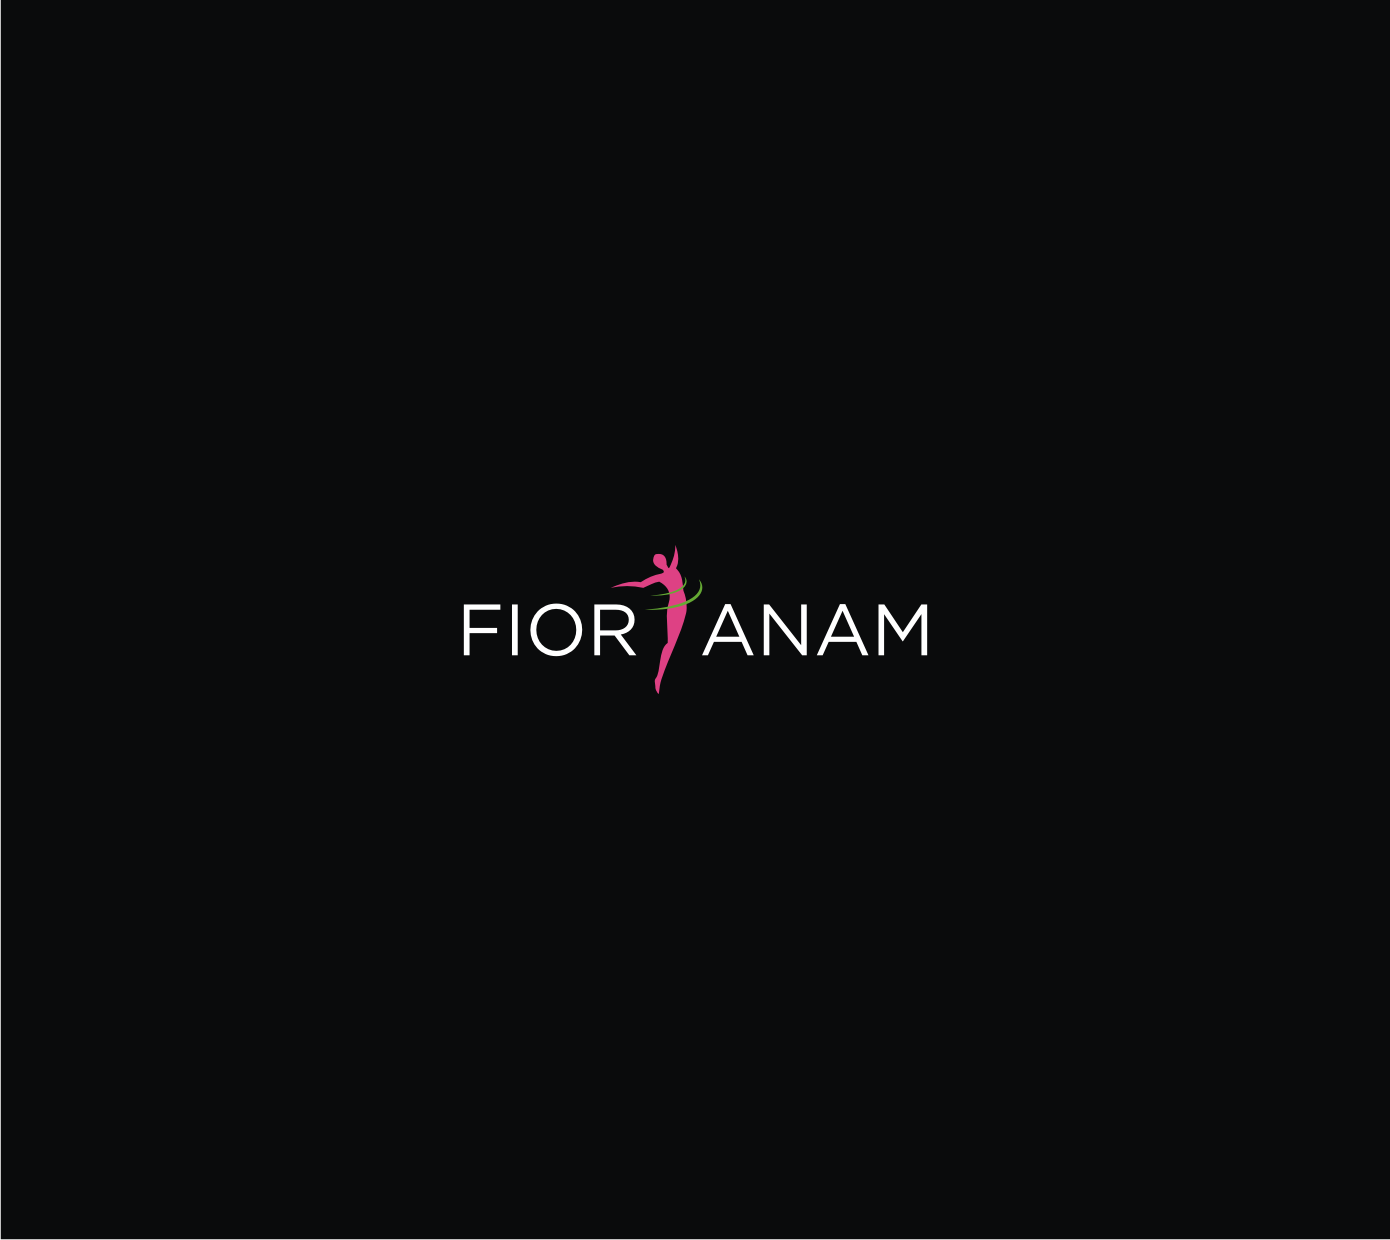 Logo Design by Sigitumarali Sigit - Entry No. 292 in the Logo Design Contest Creative Logo Design for Fior Anam.